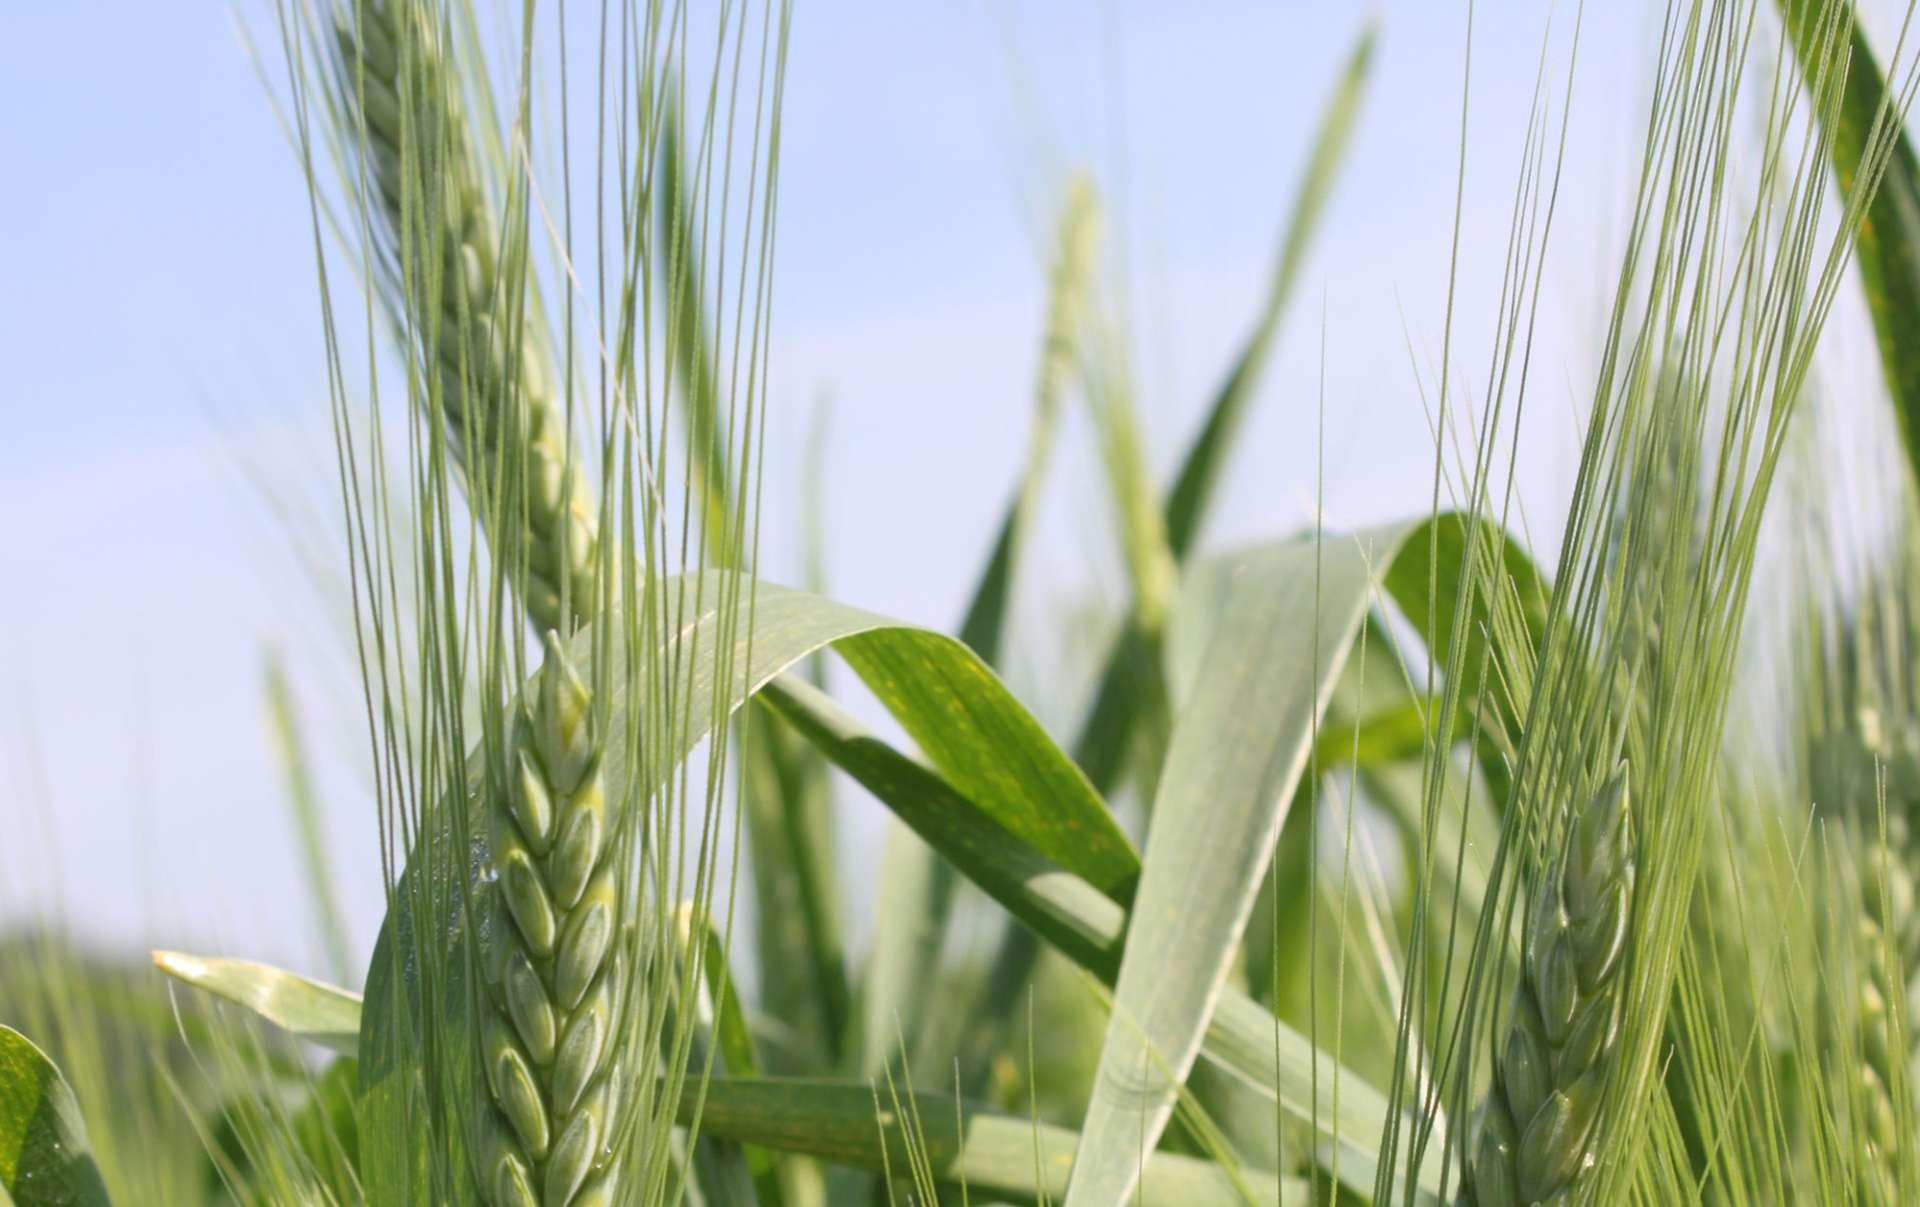 Späths Albjuwel, emmer wheat (triticum dicoccum)